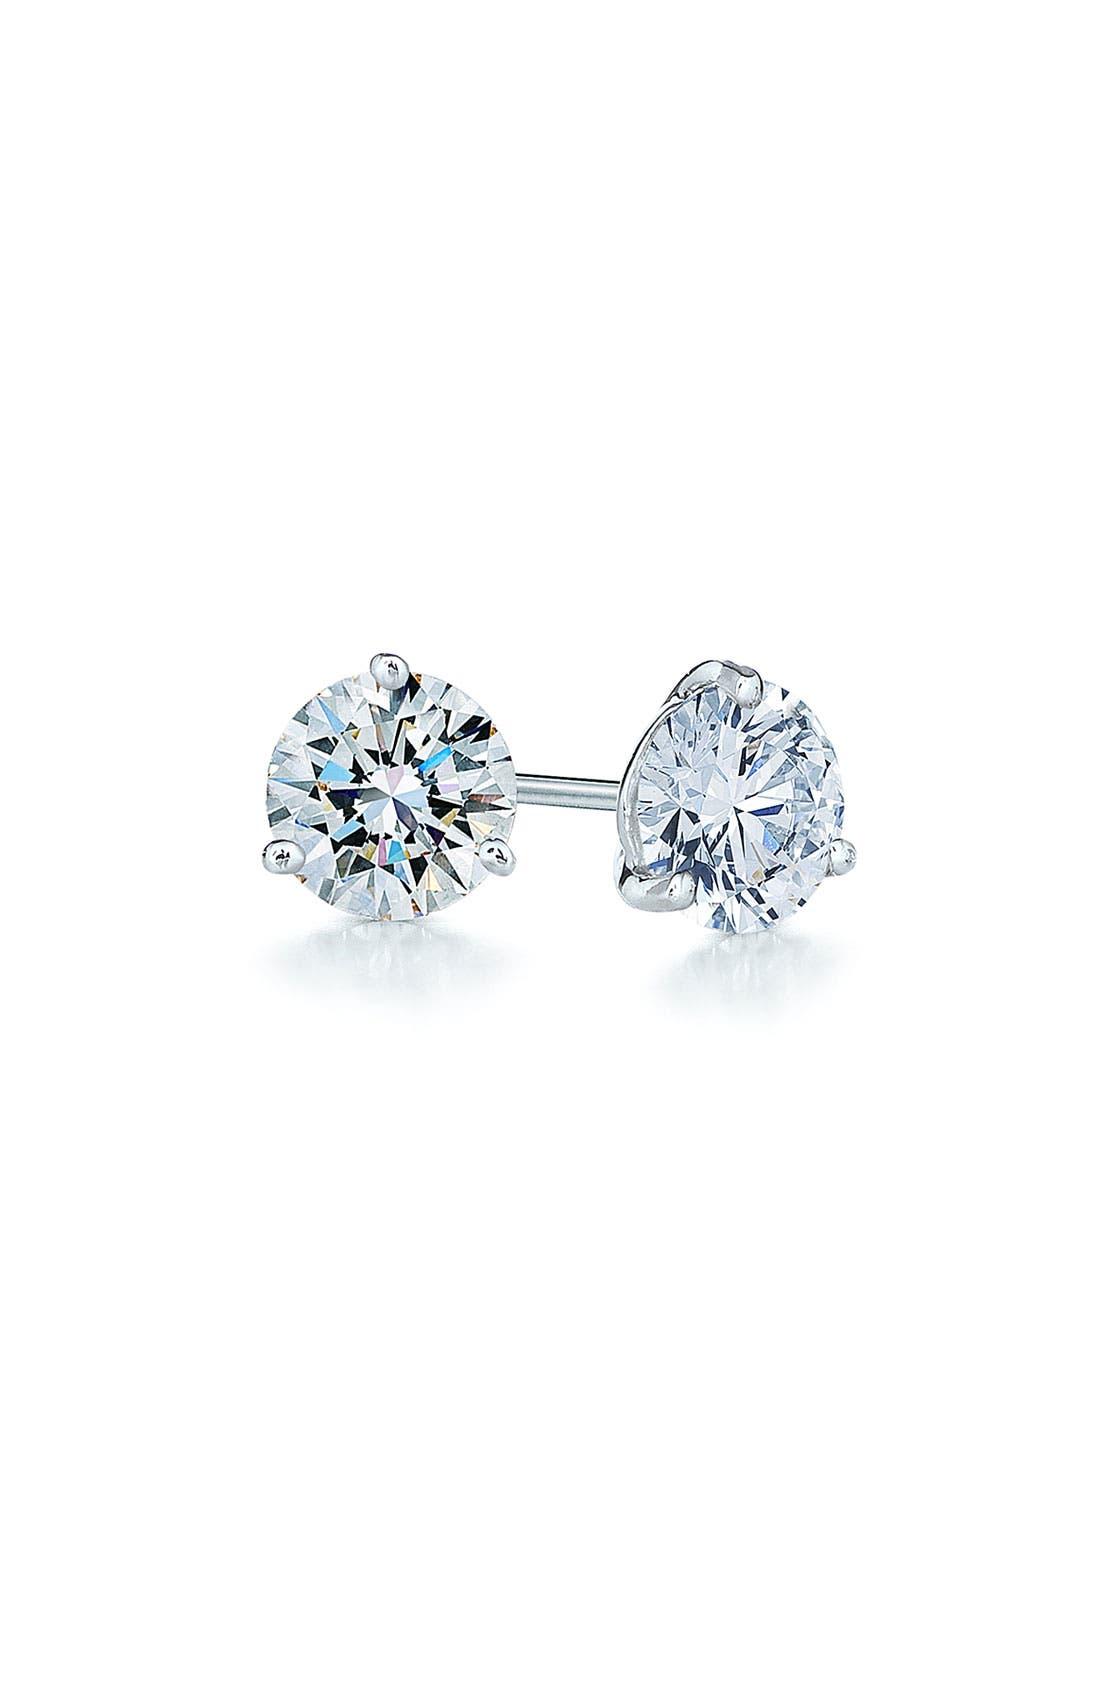 0.33ct tw Diamond & Platinum Stud Earrings,                             Main thumbnail 1, color,                             PLATINUM